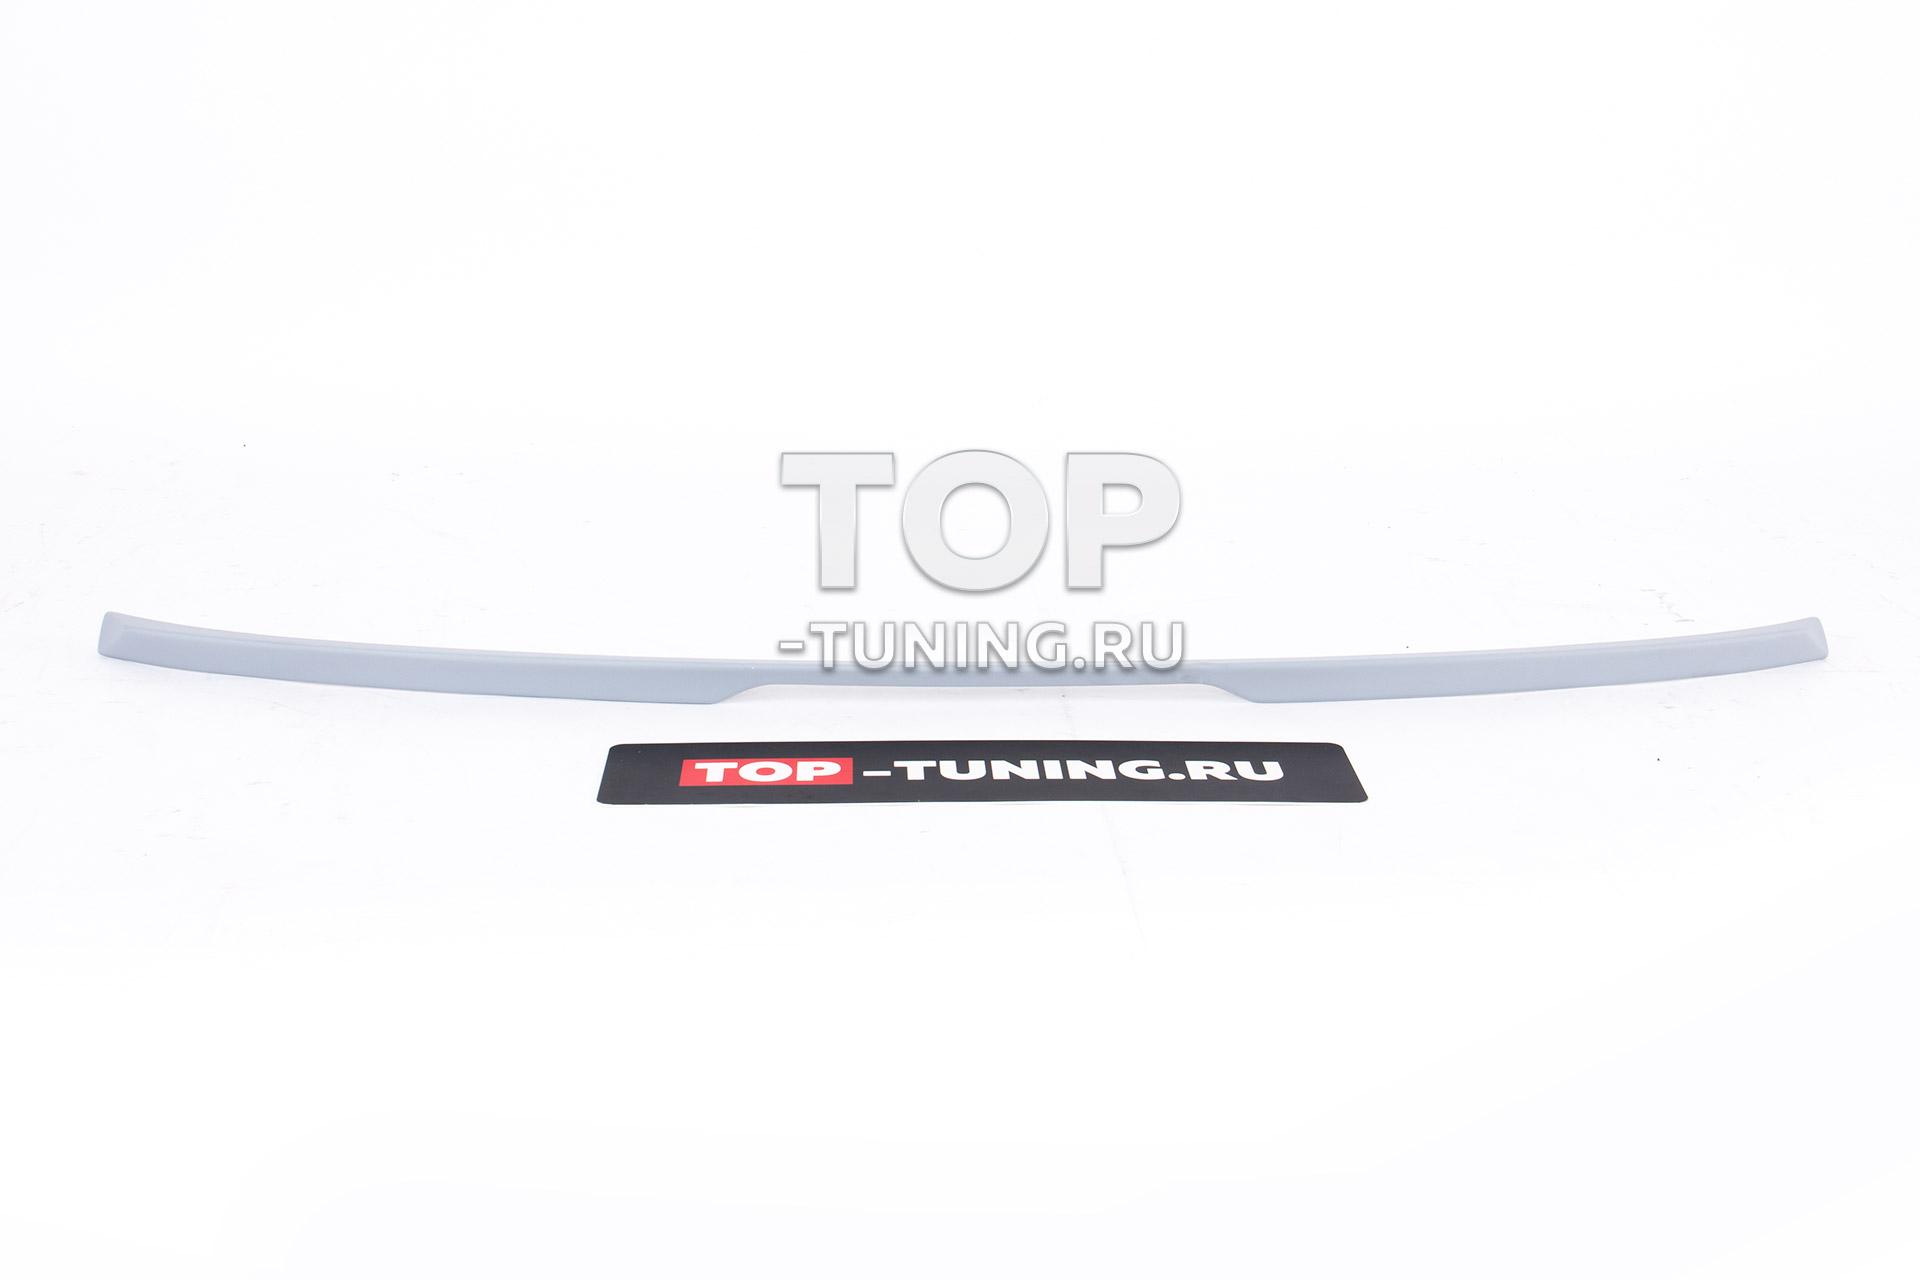 10209 Нижний спойлер Renegade для BMW X7 G07 2018+